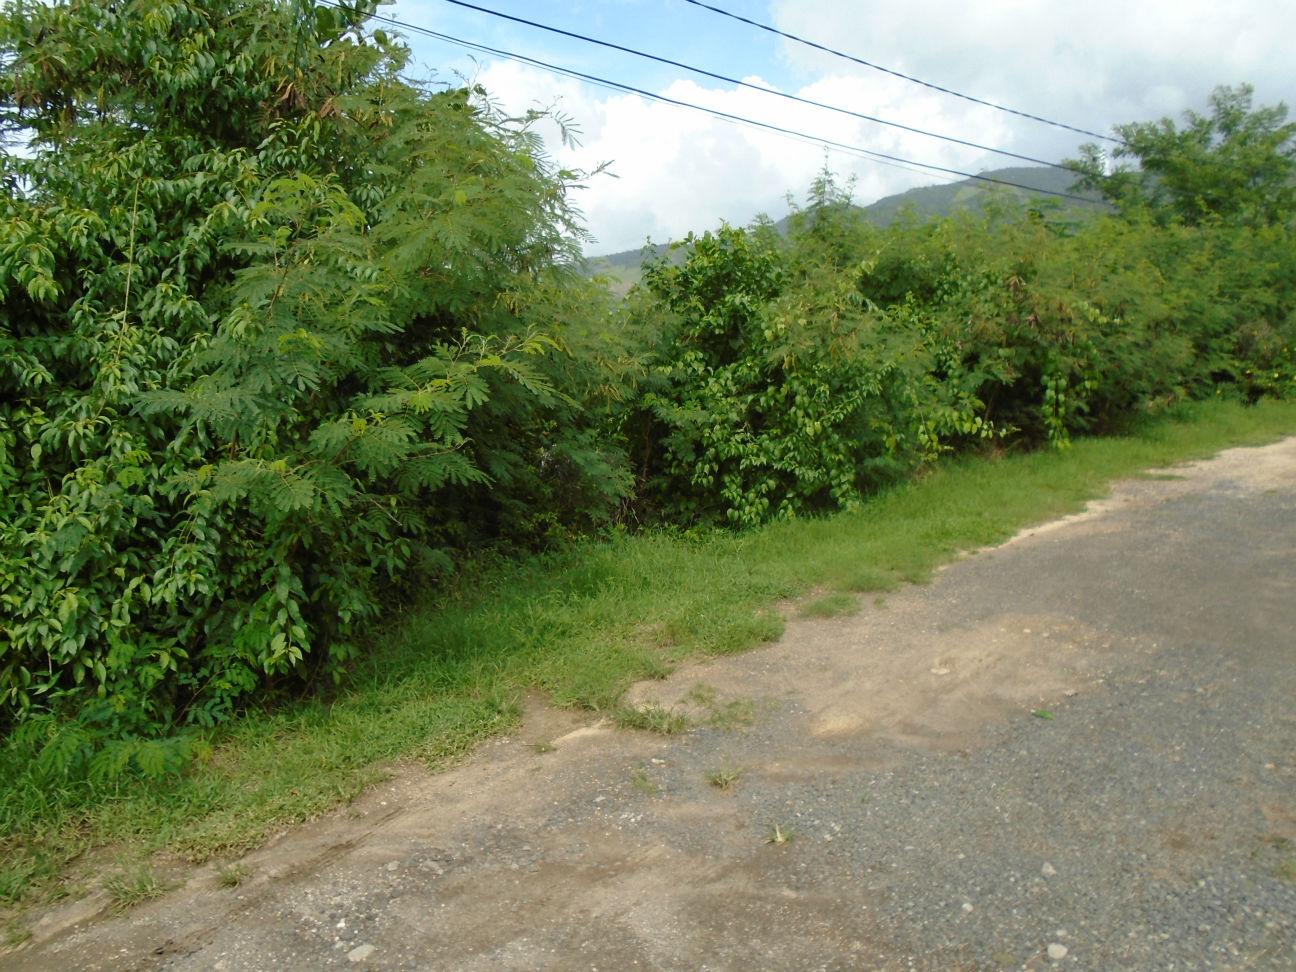 Dominica Real Estate: Land For Sale In Morne Daniel